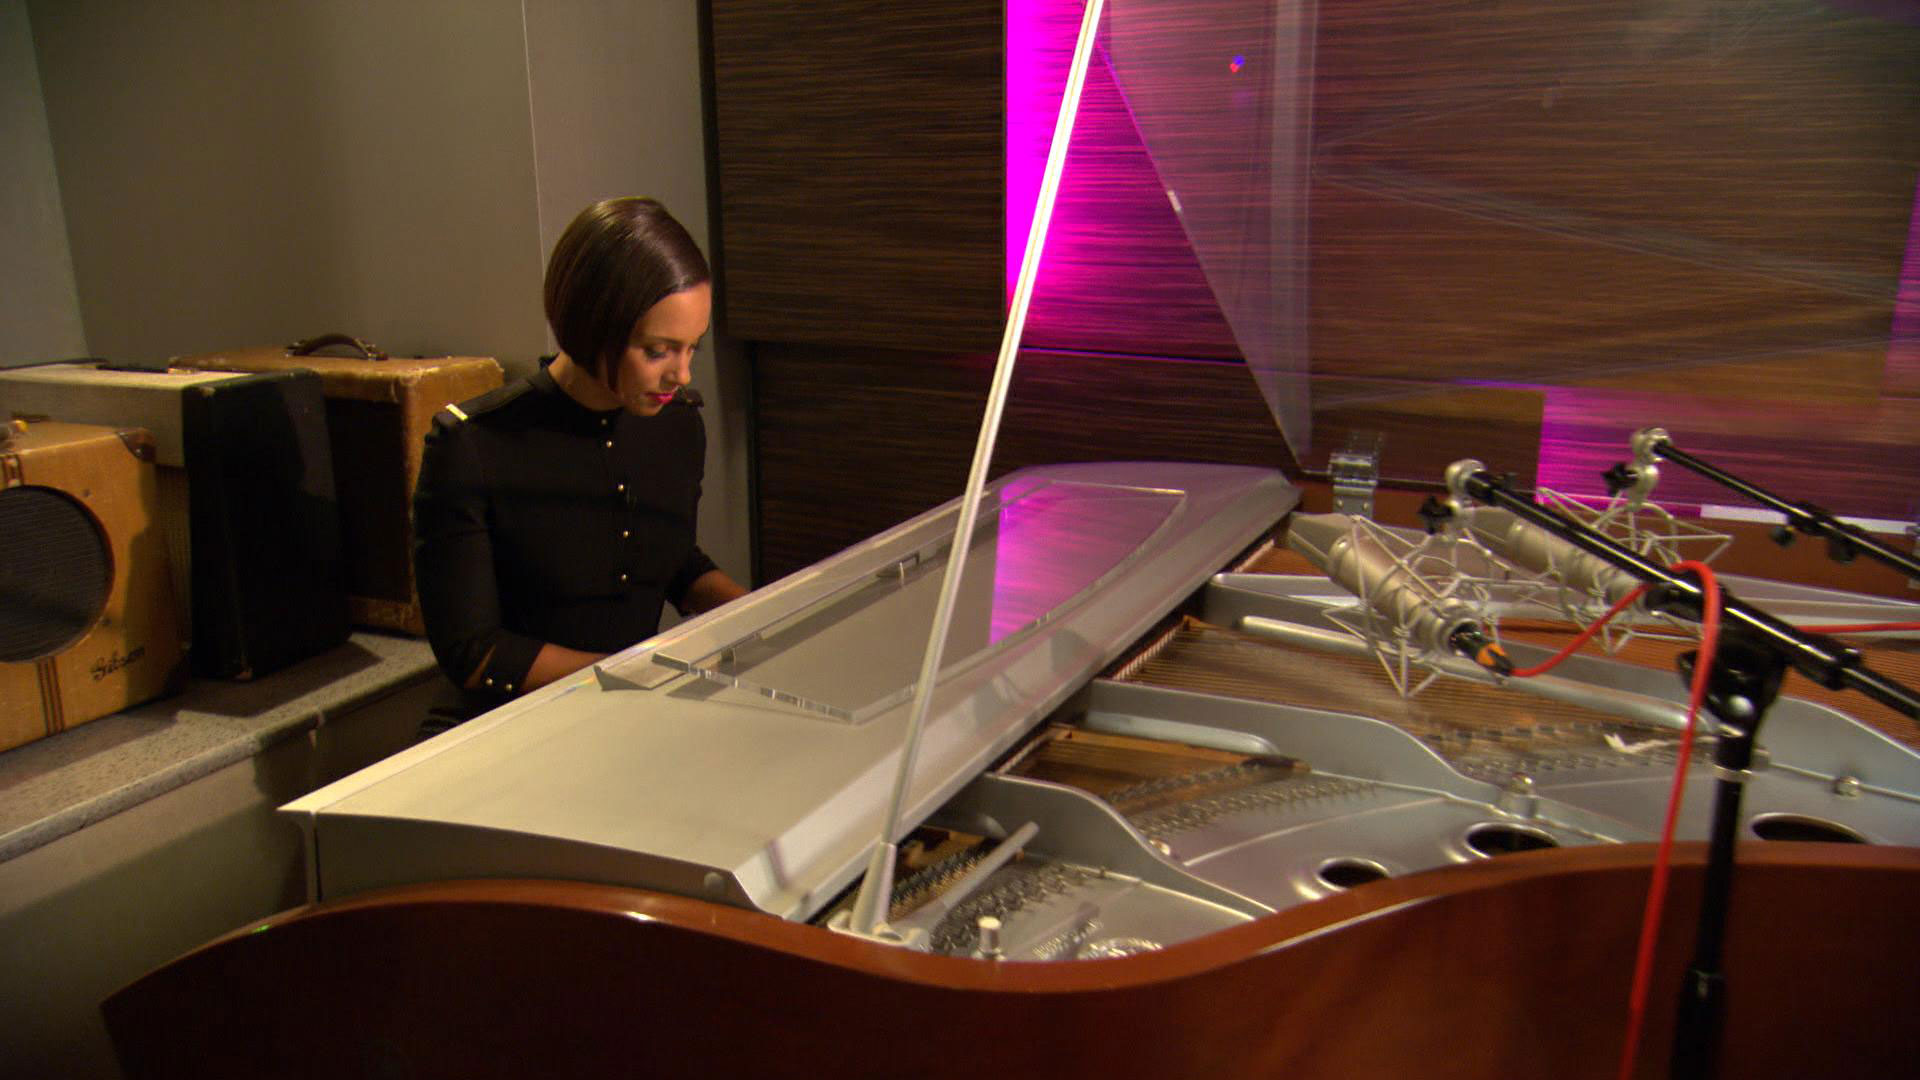 inside alicia keys 39 private recording studio photo 1. Black Bedroom Furniture Sets. Home Design Ideas